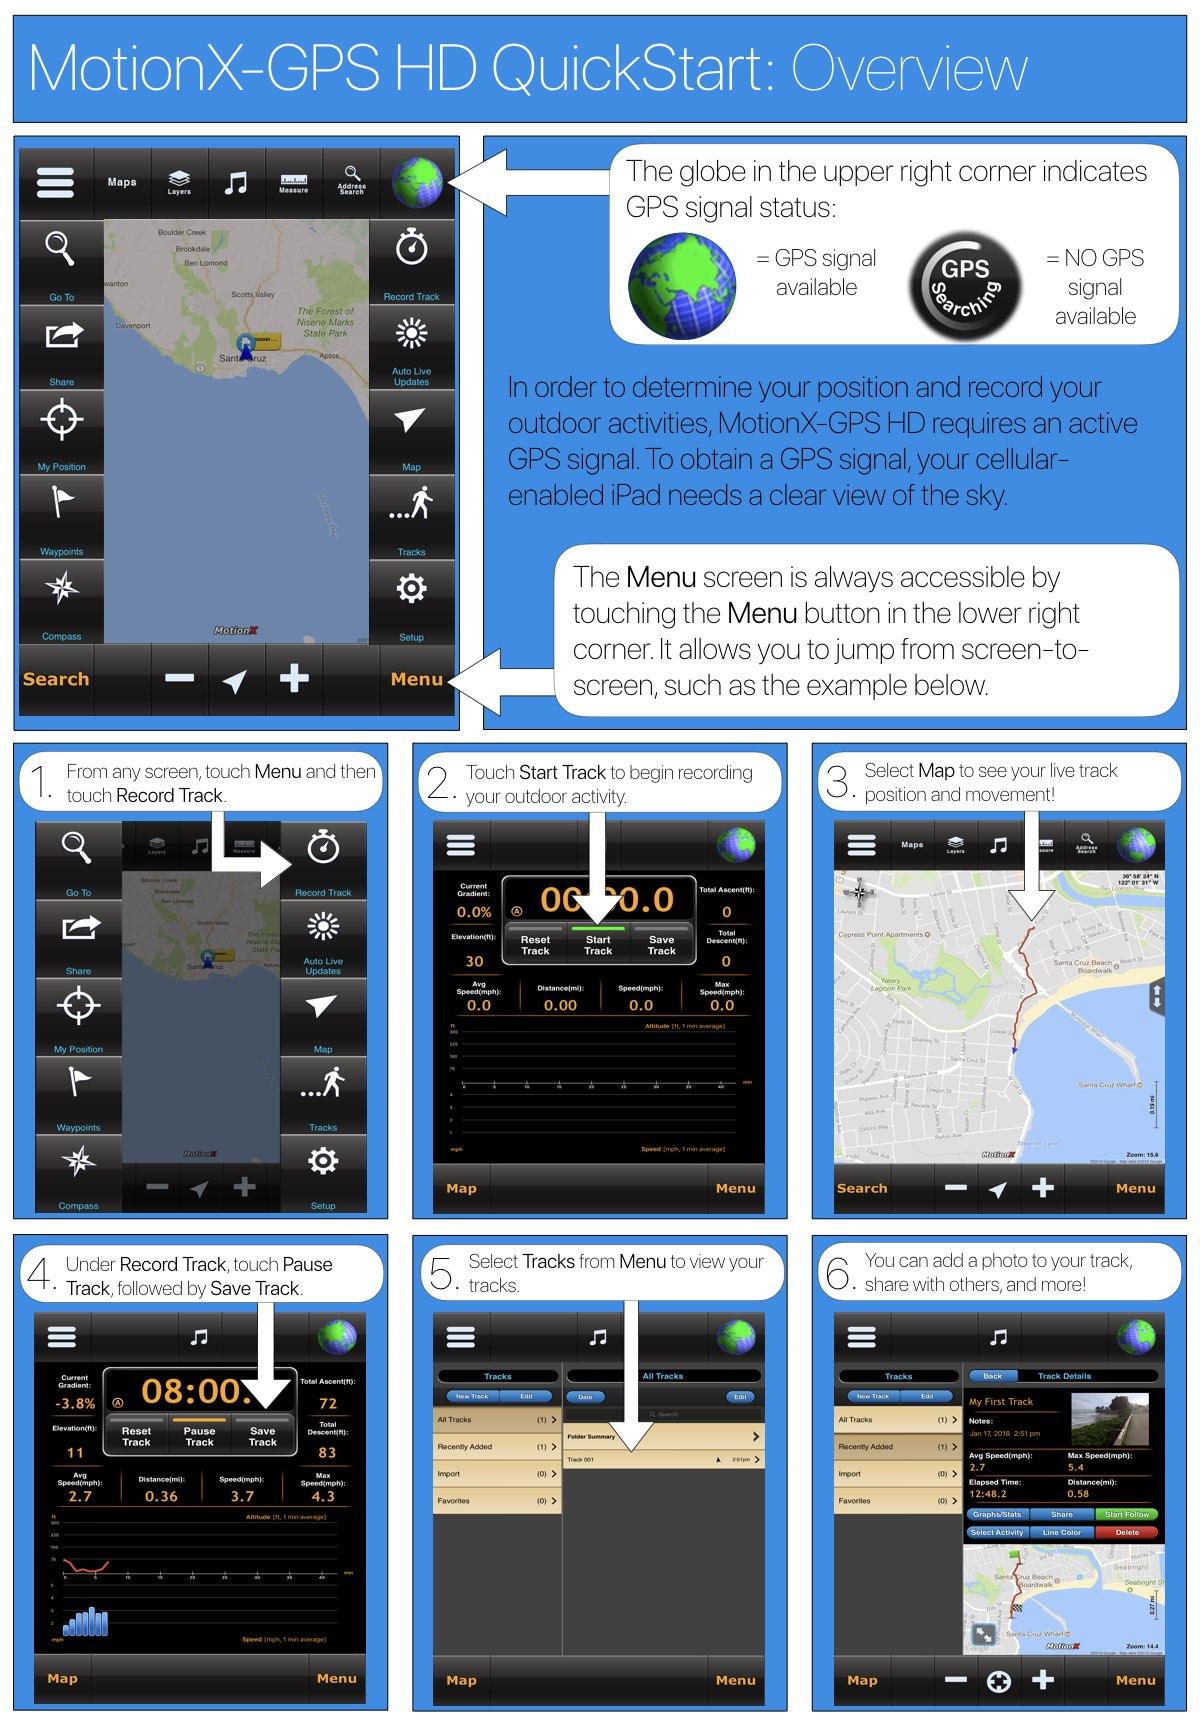 motionx gps ipad quickstart guide motionx rh gps motionx com MotionX-GPS Drive for Android MotionX-GPS Lite